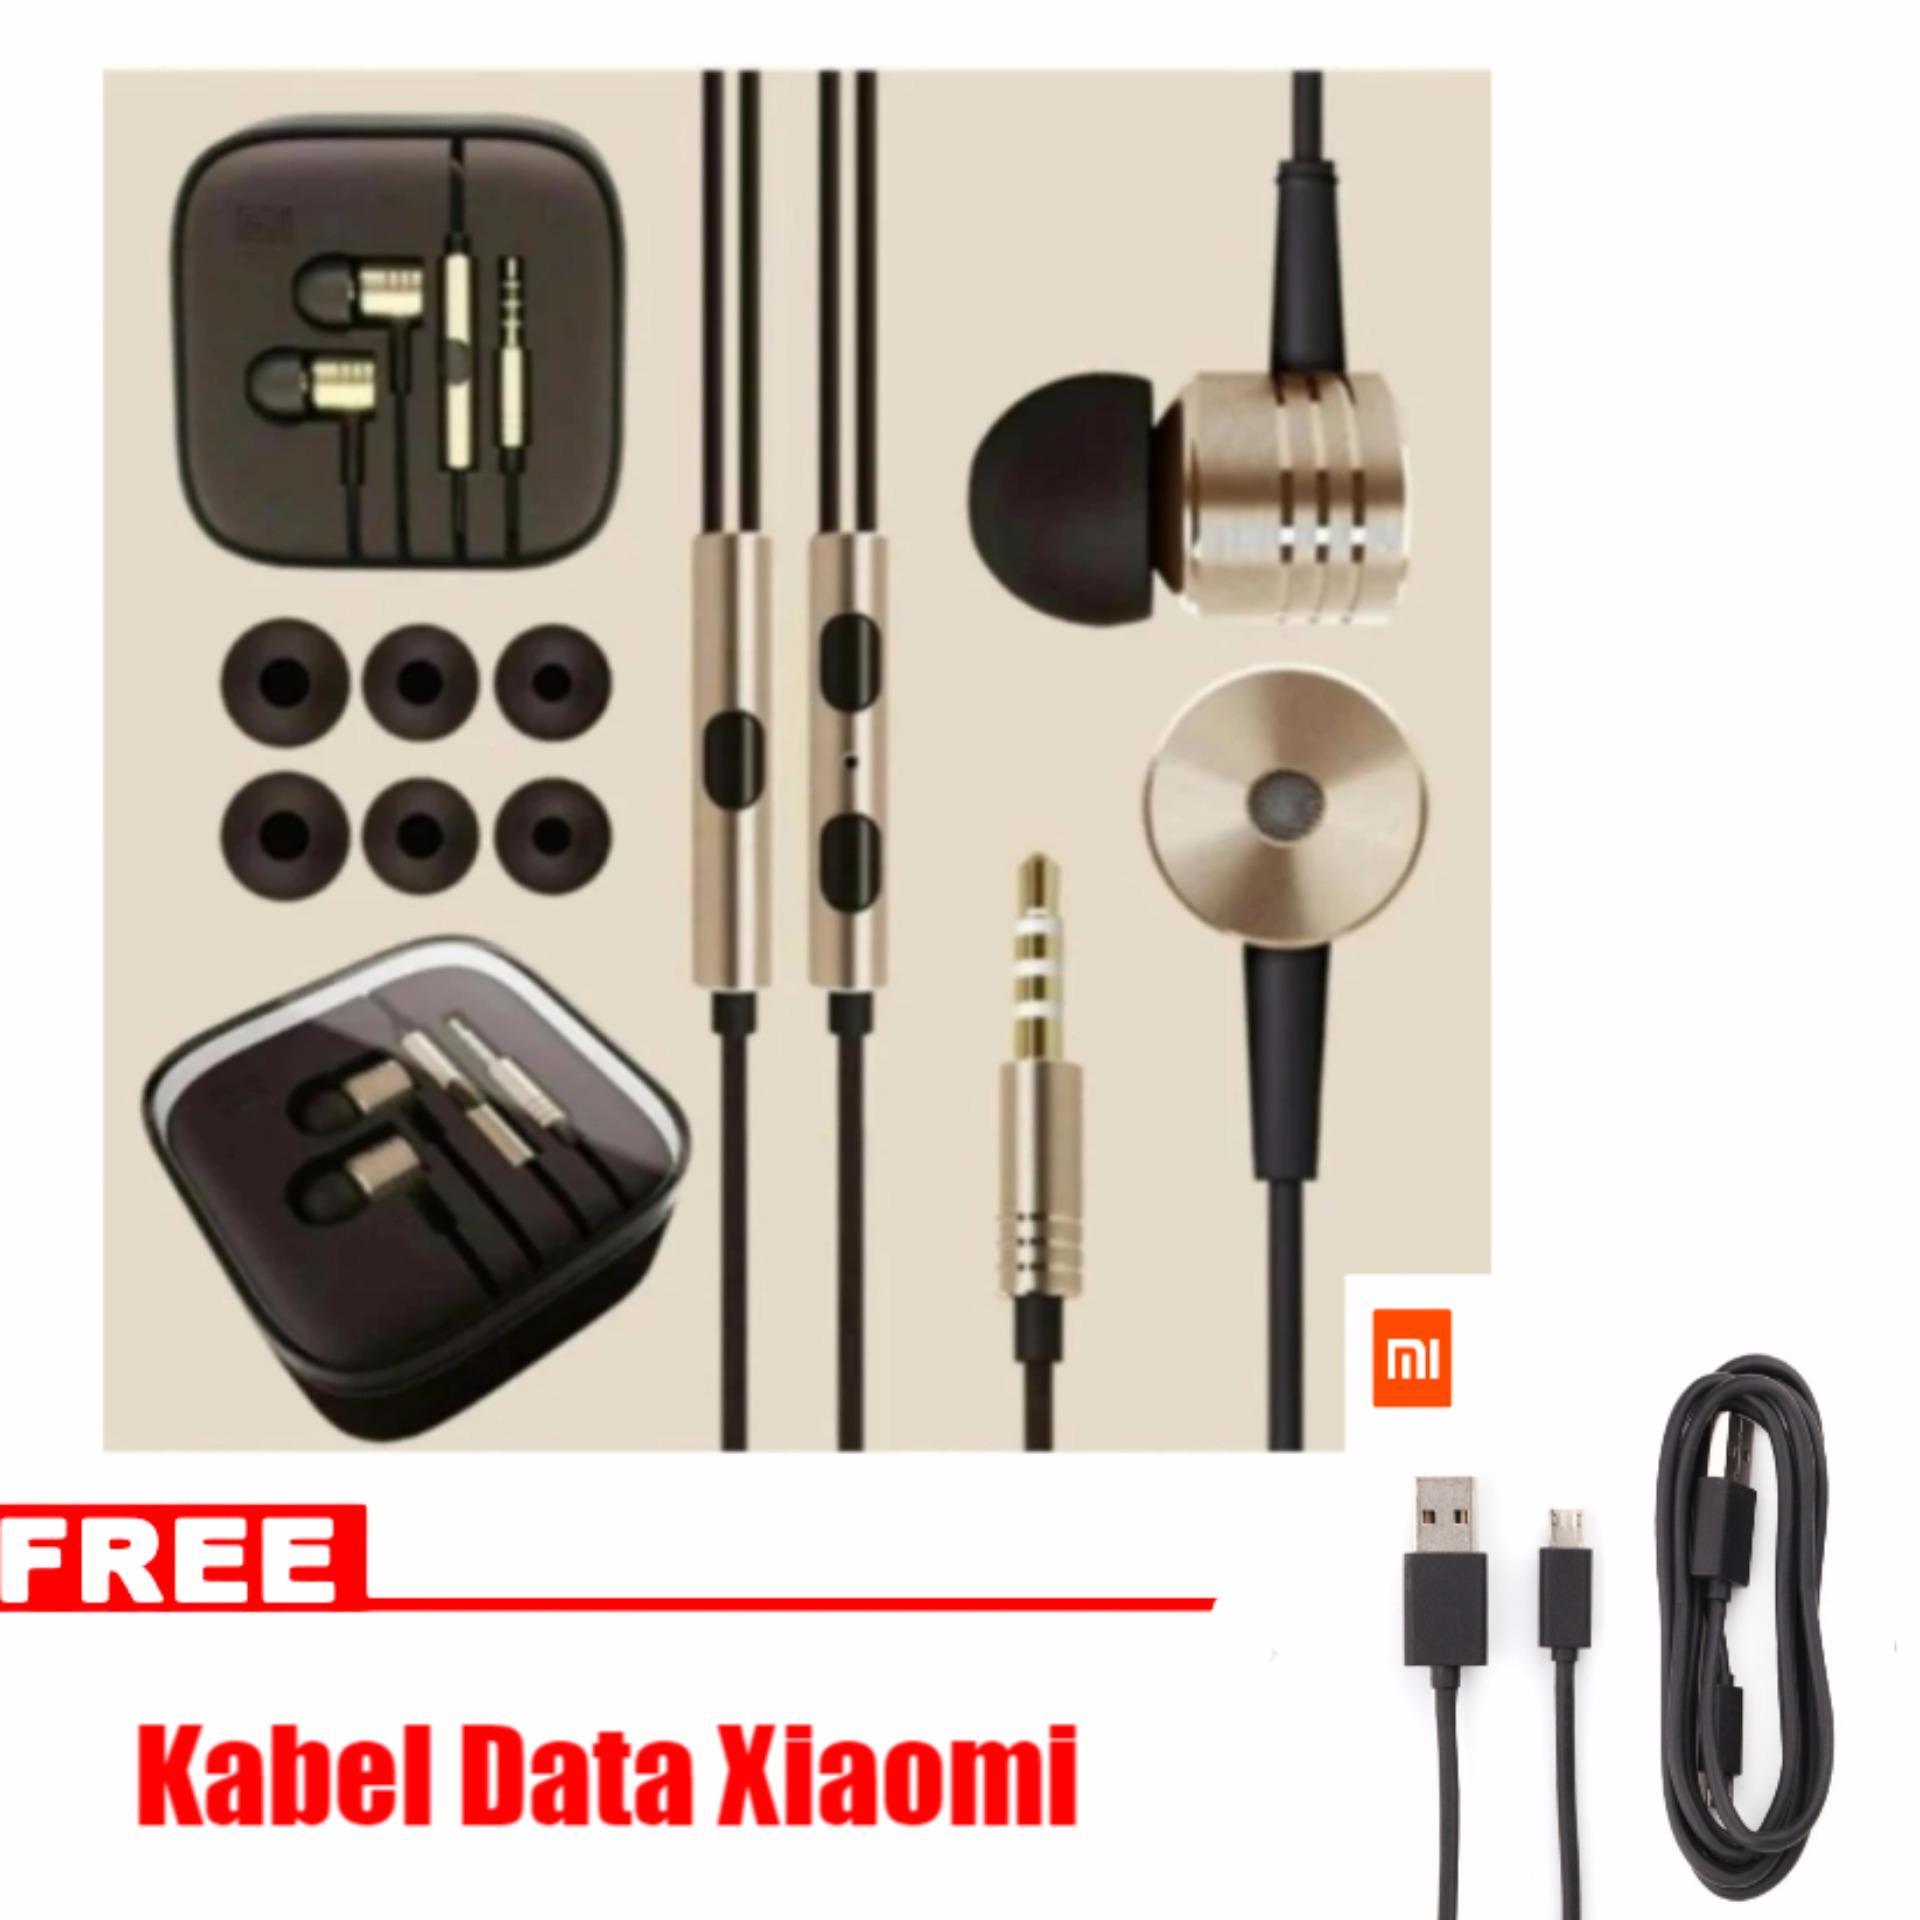 ... Handsfree Xiaomi Earphone Big Bass Piston Mi 2nd Generation Handsfree/ Headset - Gold Free Kabel ...